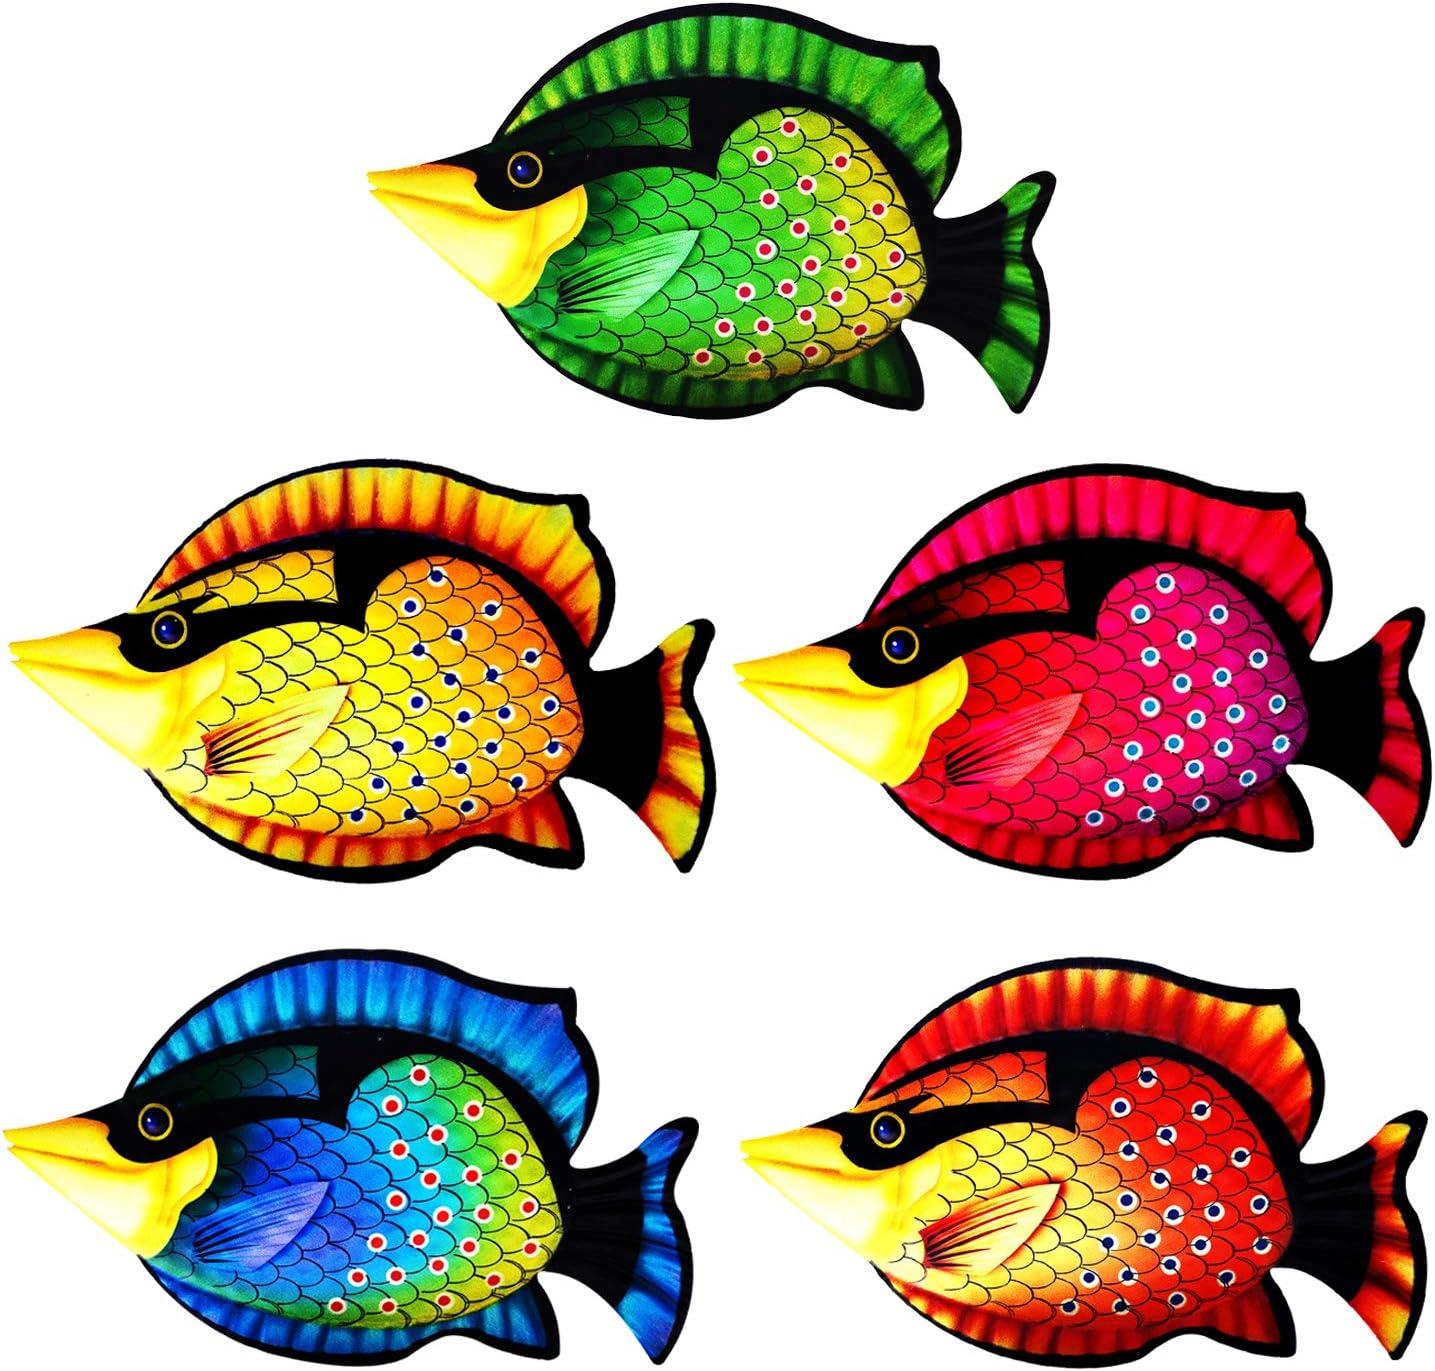 MYJAQI 5 Pcs Coastal Decor Metal Fish Wall Art Garden Pool Decor, Vivid Colorful Fish Art Wall Hanging for Pool Home Porch Fence Garden (12 Inch x 7 Inch)